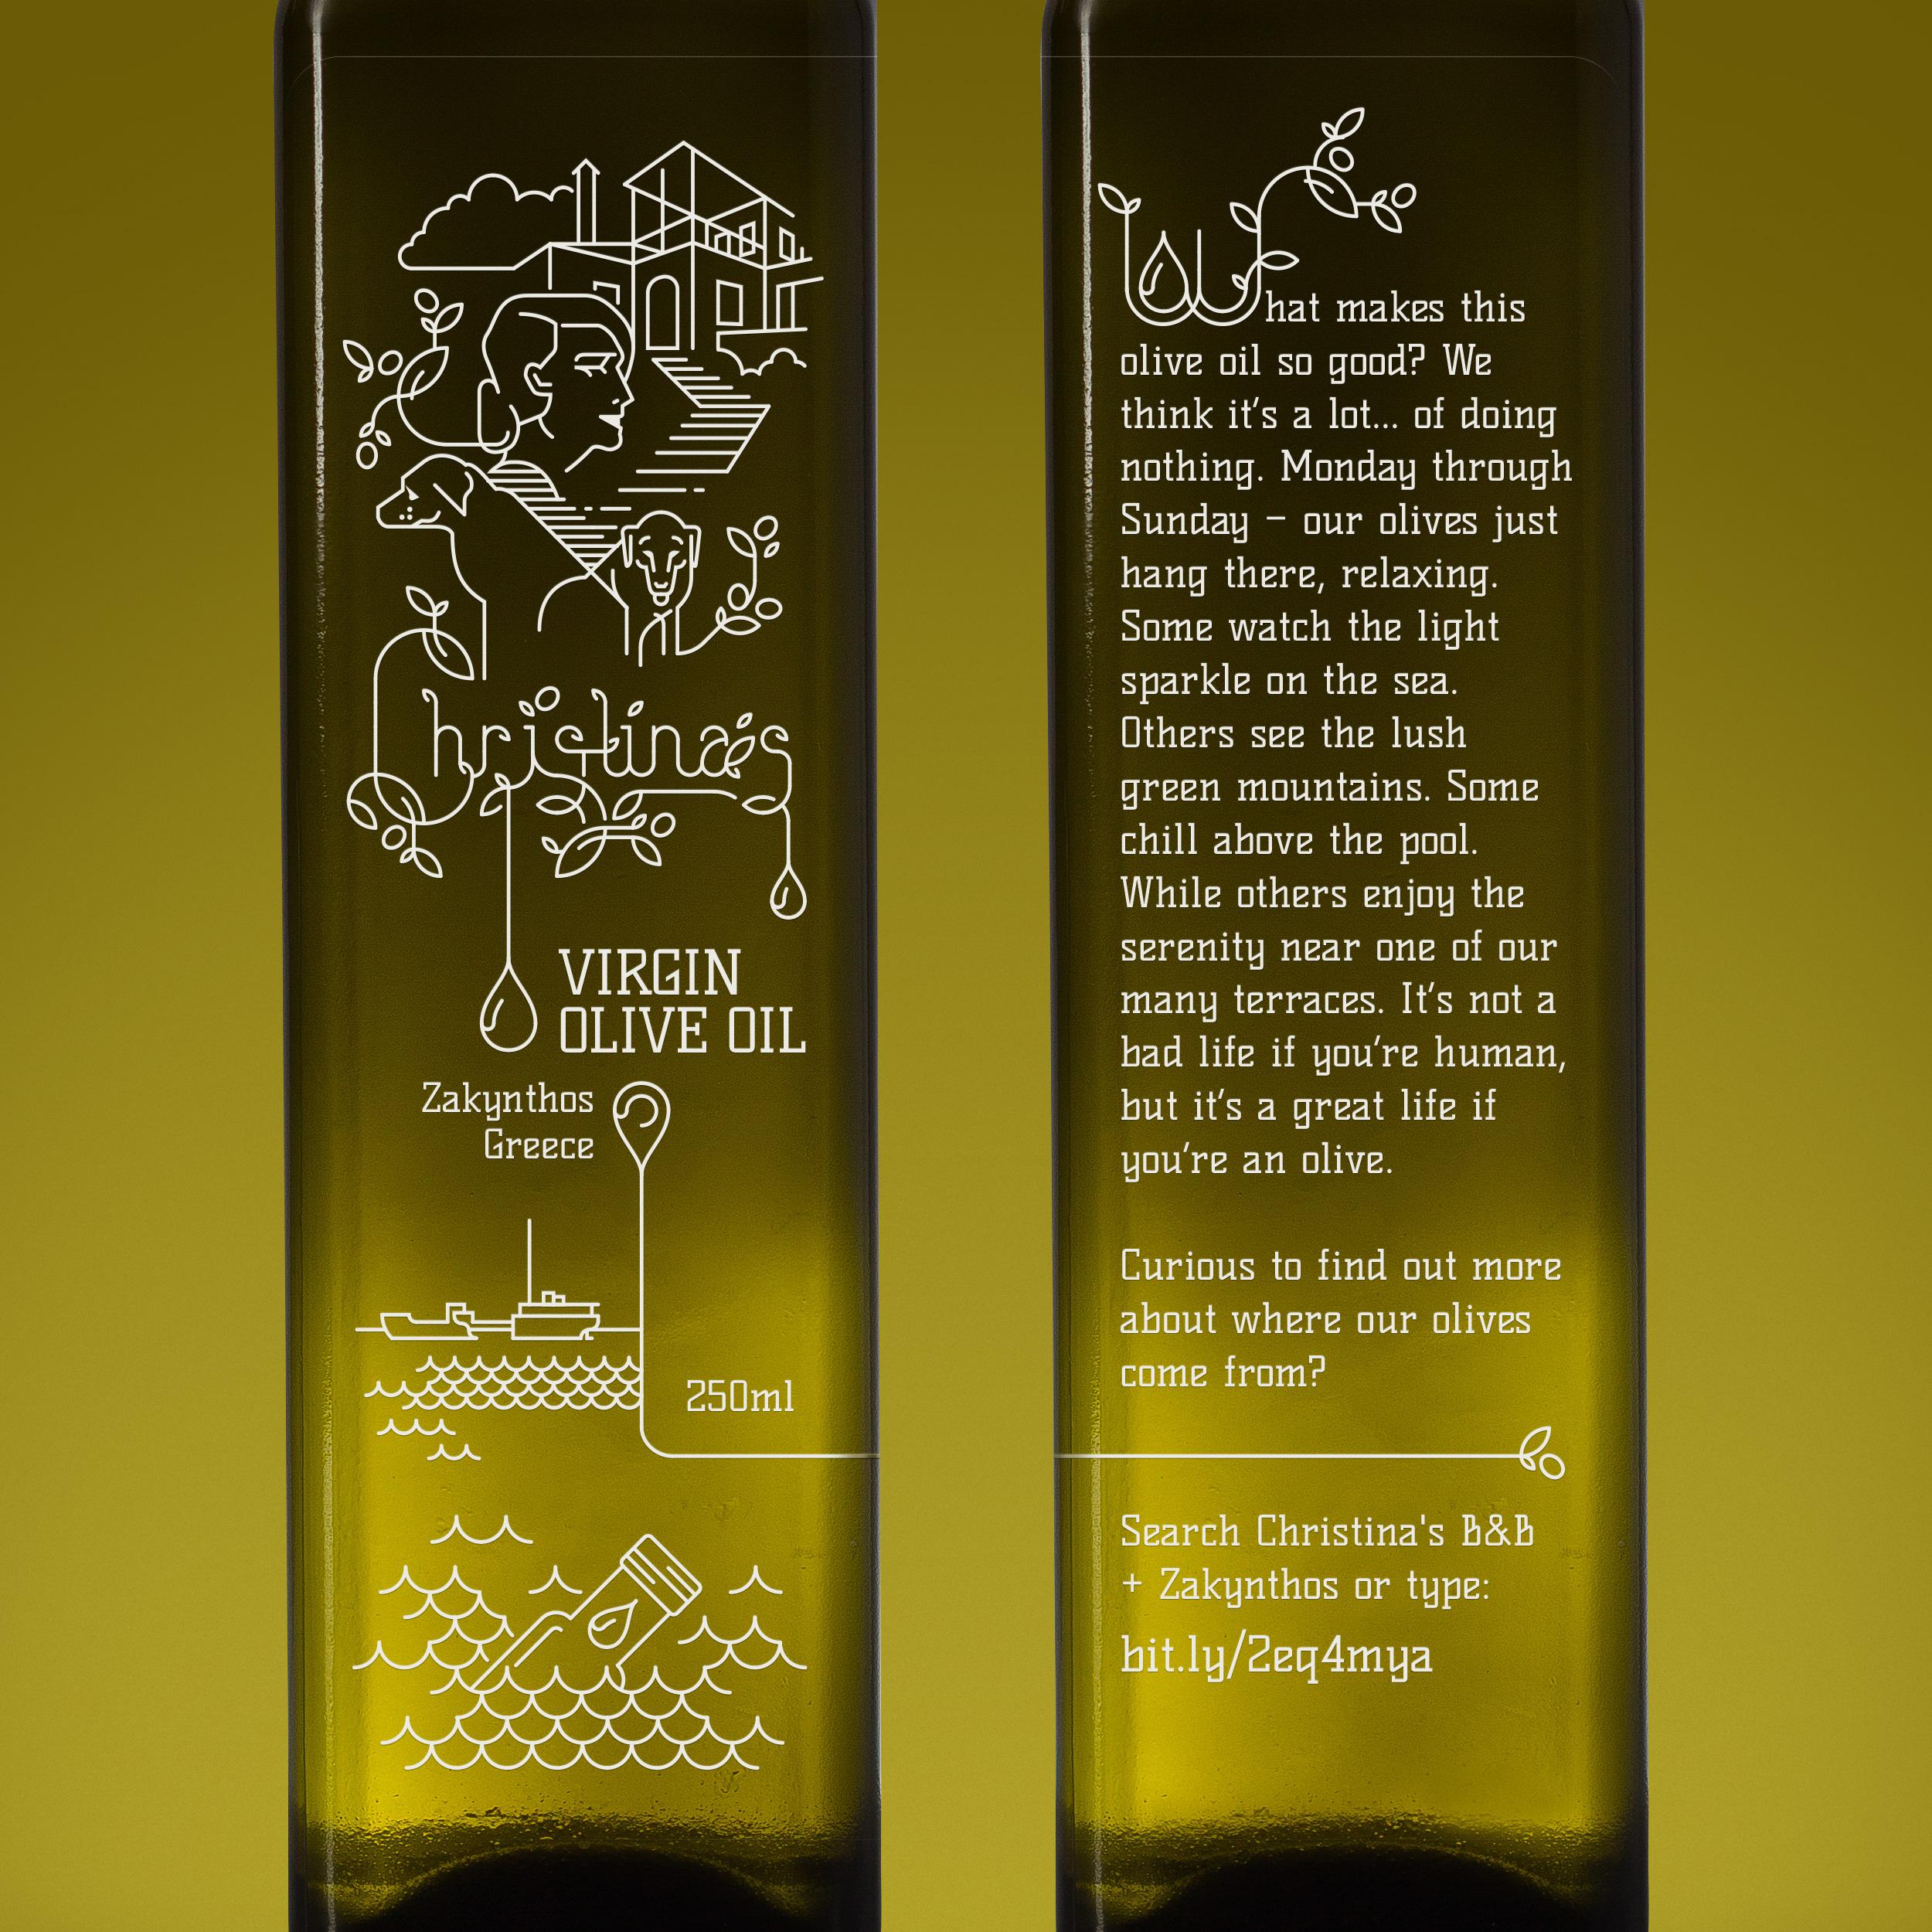 illustration_andre_levy_zhion_vector_outline_olive_oil_bottle_label_message_zakynthos_bnb_project_david_simons_logo_portrait_2.jpg